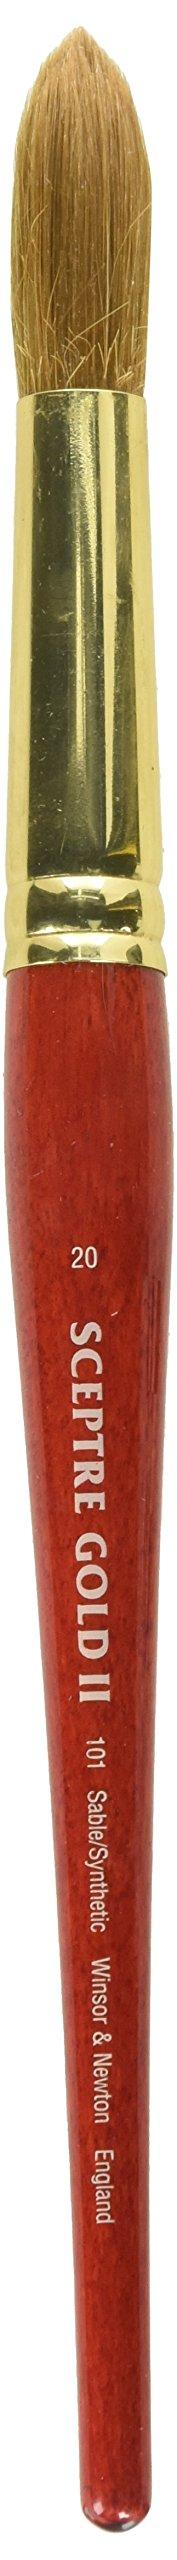 Winsor & Newton Sceptre Gold II Series 101 Short Handle Brush-Round #20 by Winsor & Newton